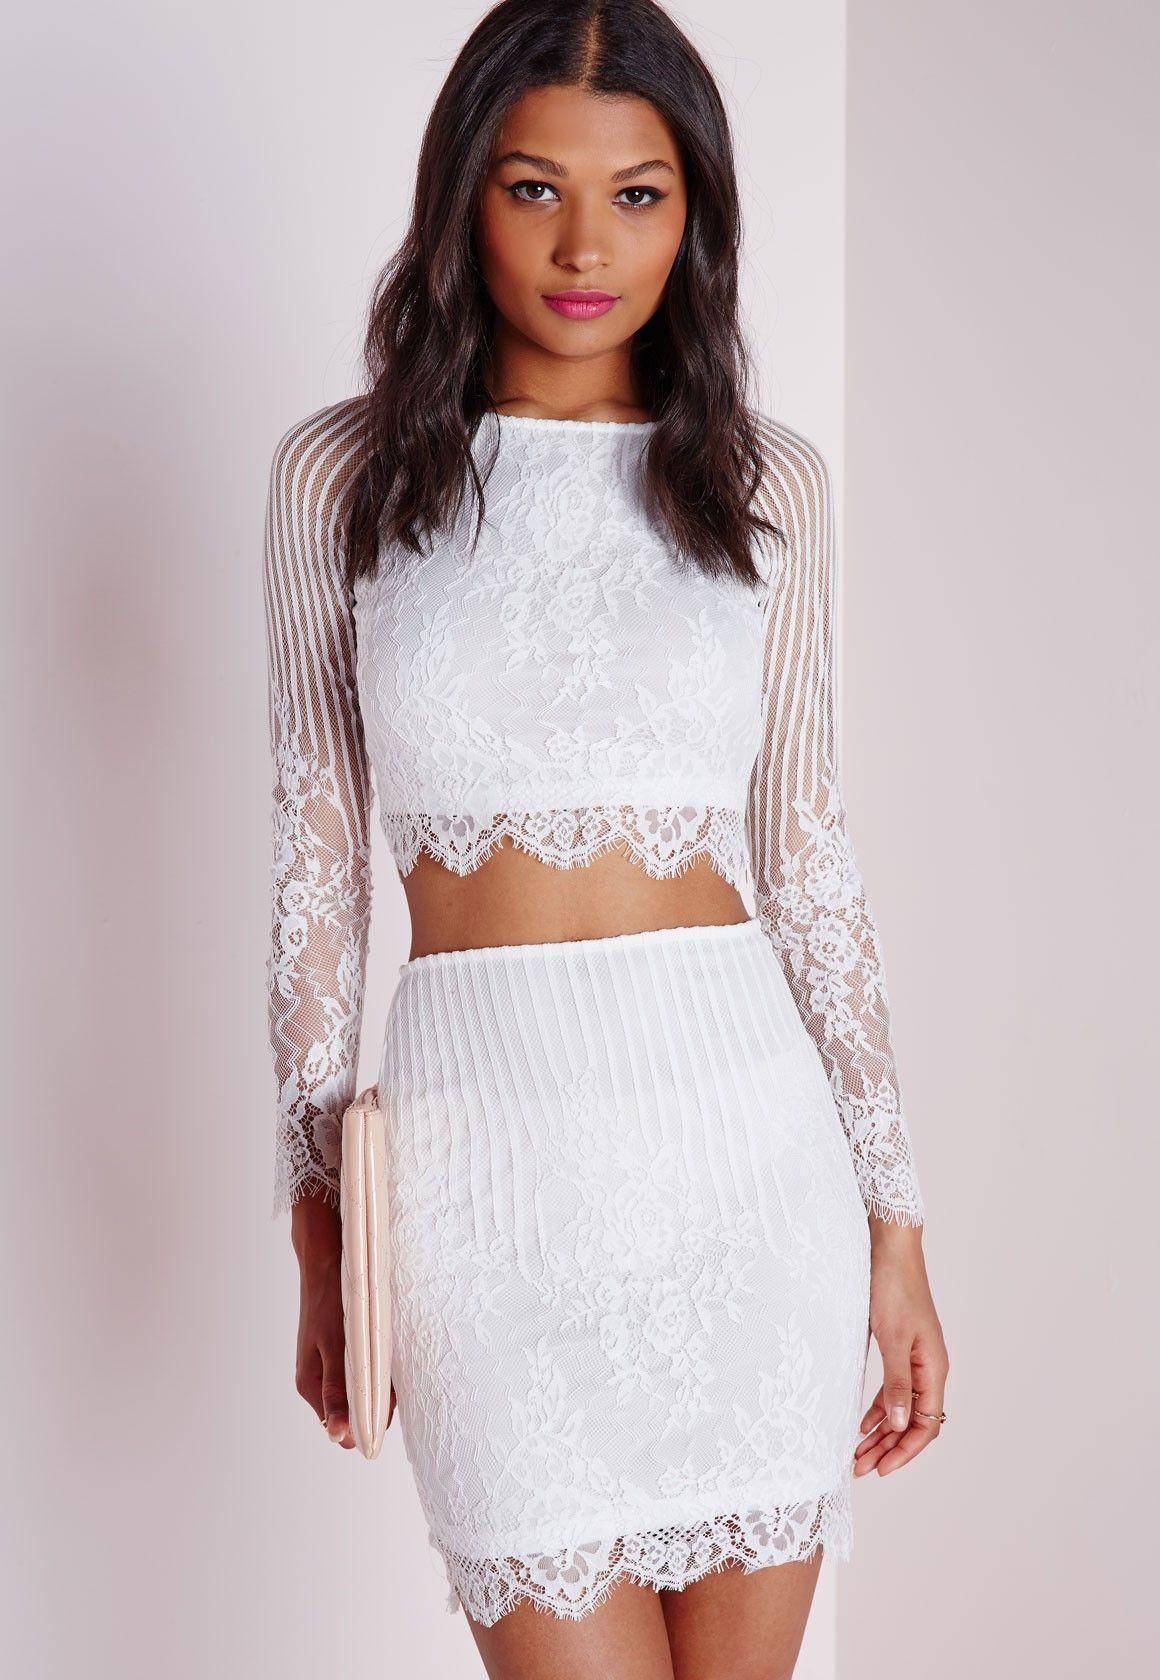 lace bodycon mini skirt white mini jupe moulante jupe moulante et dentelle blanche. Black Bedroom Furniture Sets. Home Design Ideas